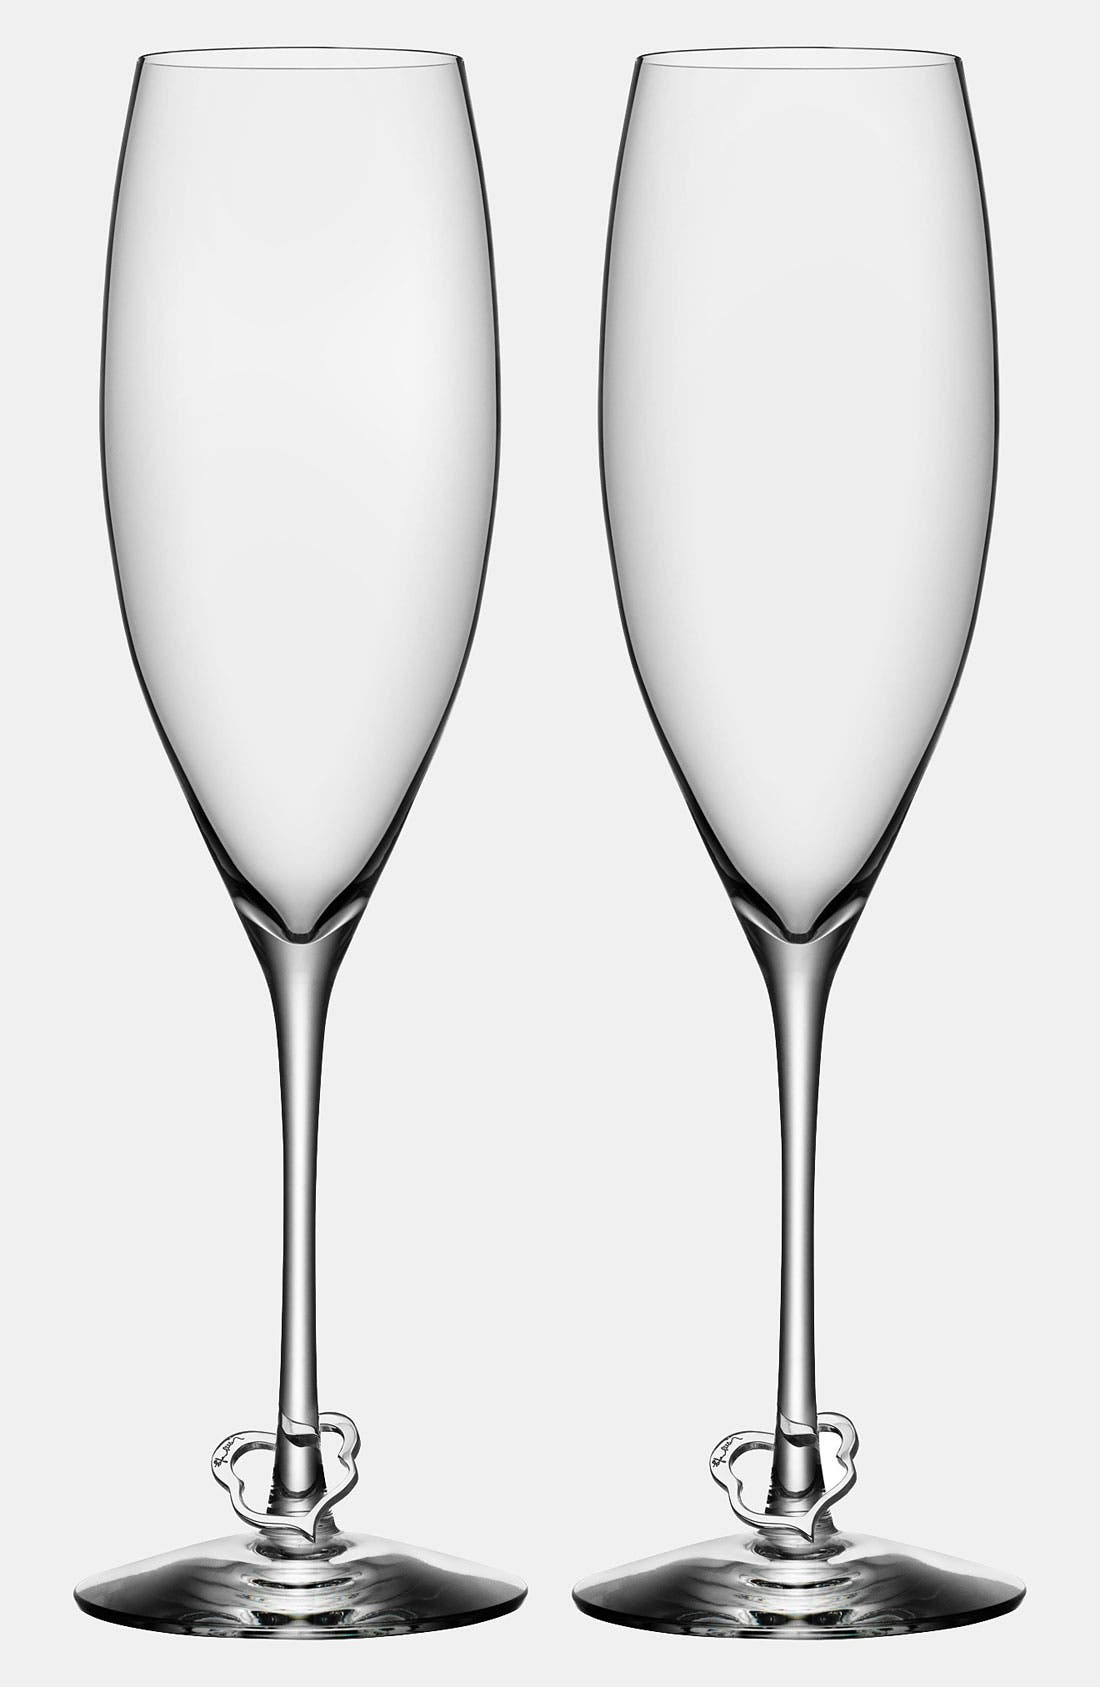 Main Image - Orrefors 'Crazy Heart' Champagne Flutes (Set of 2)